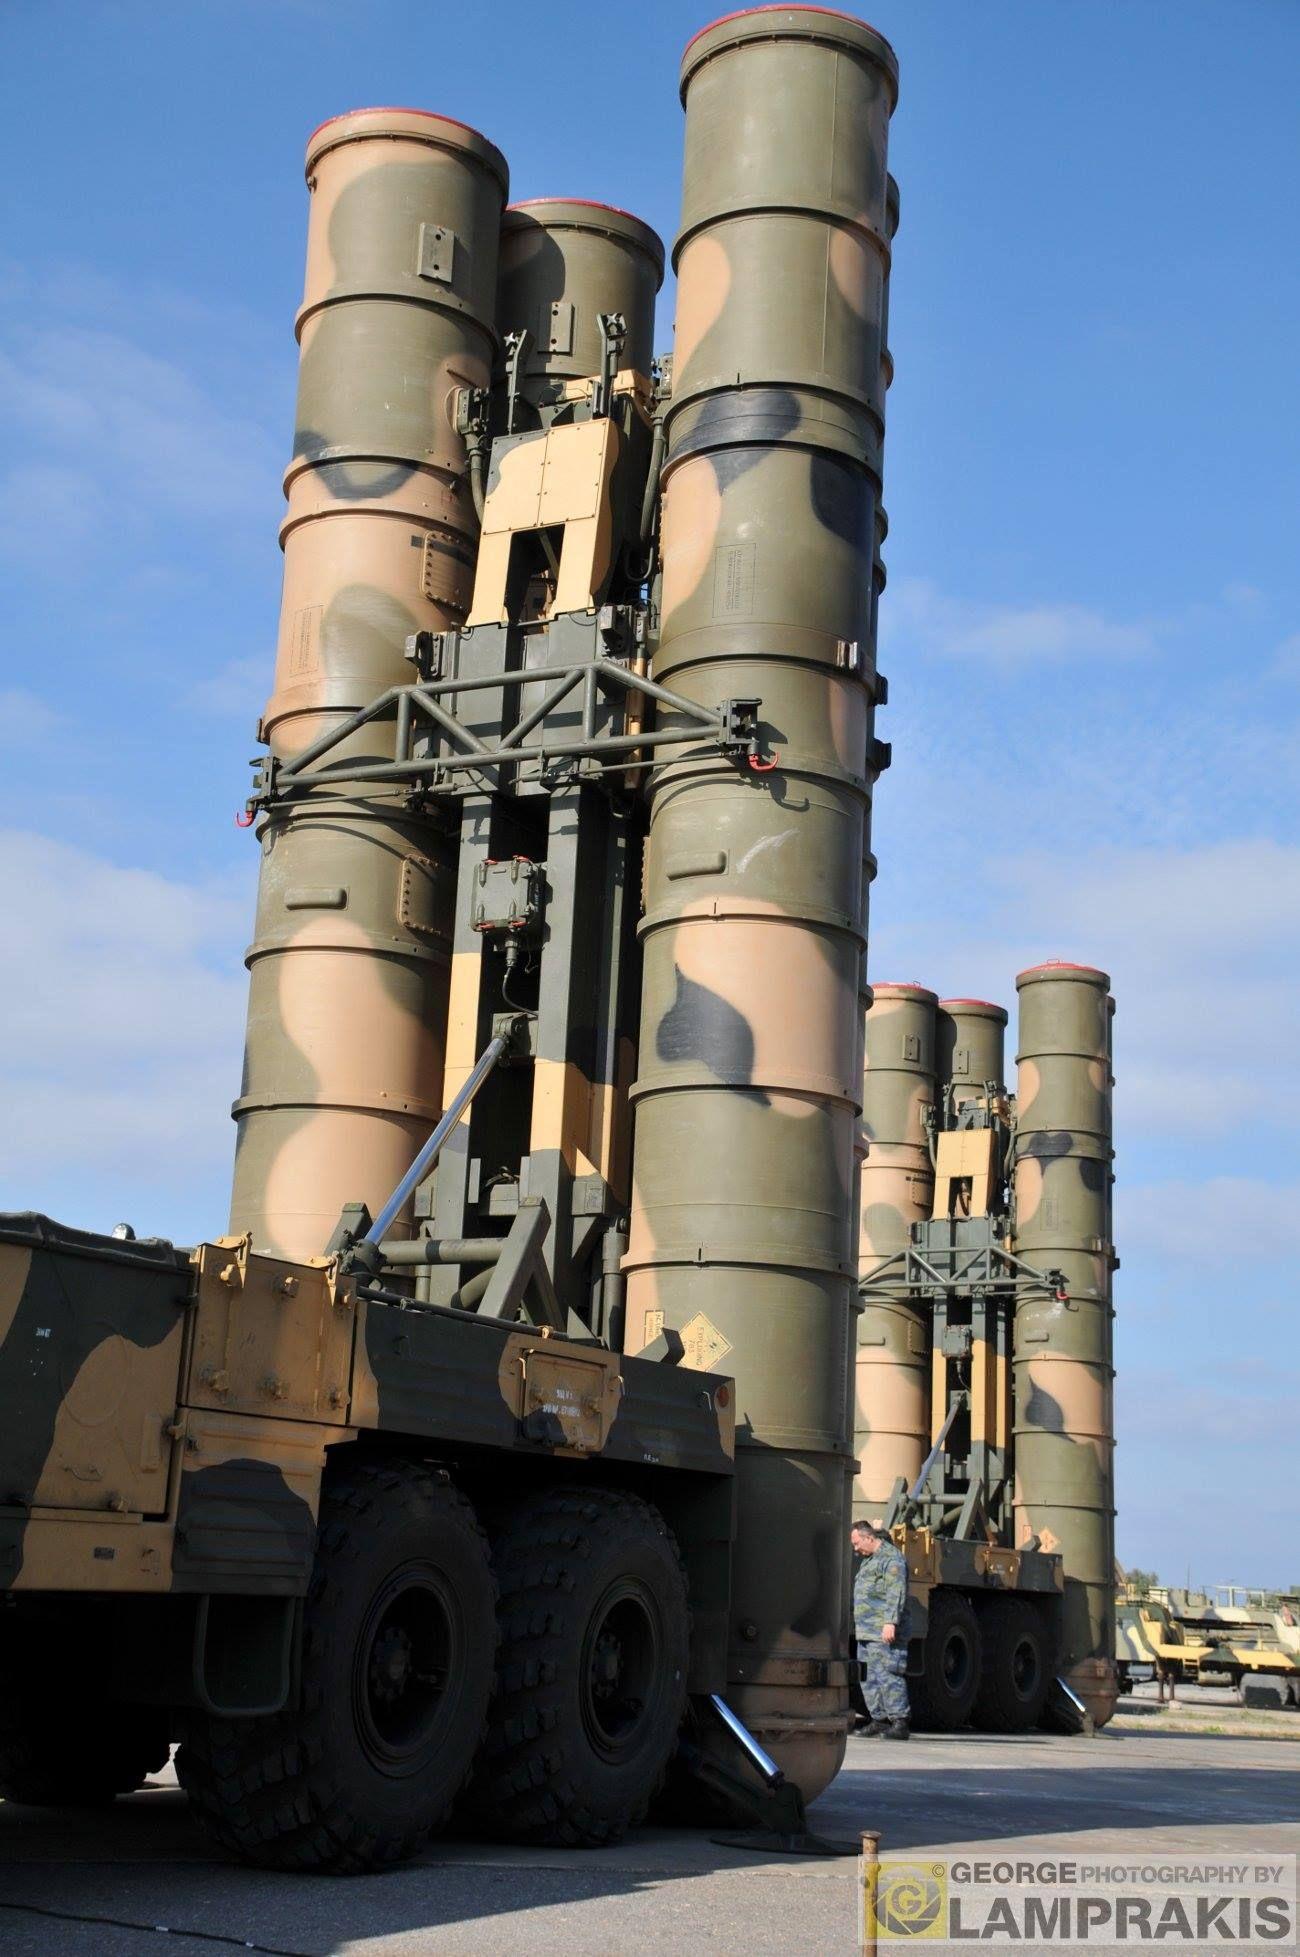 s300防空导弹_俄制S300导弹在北约基地发射_军事_环球网